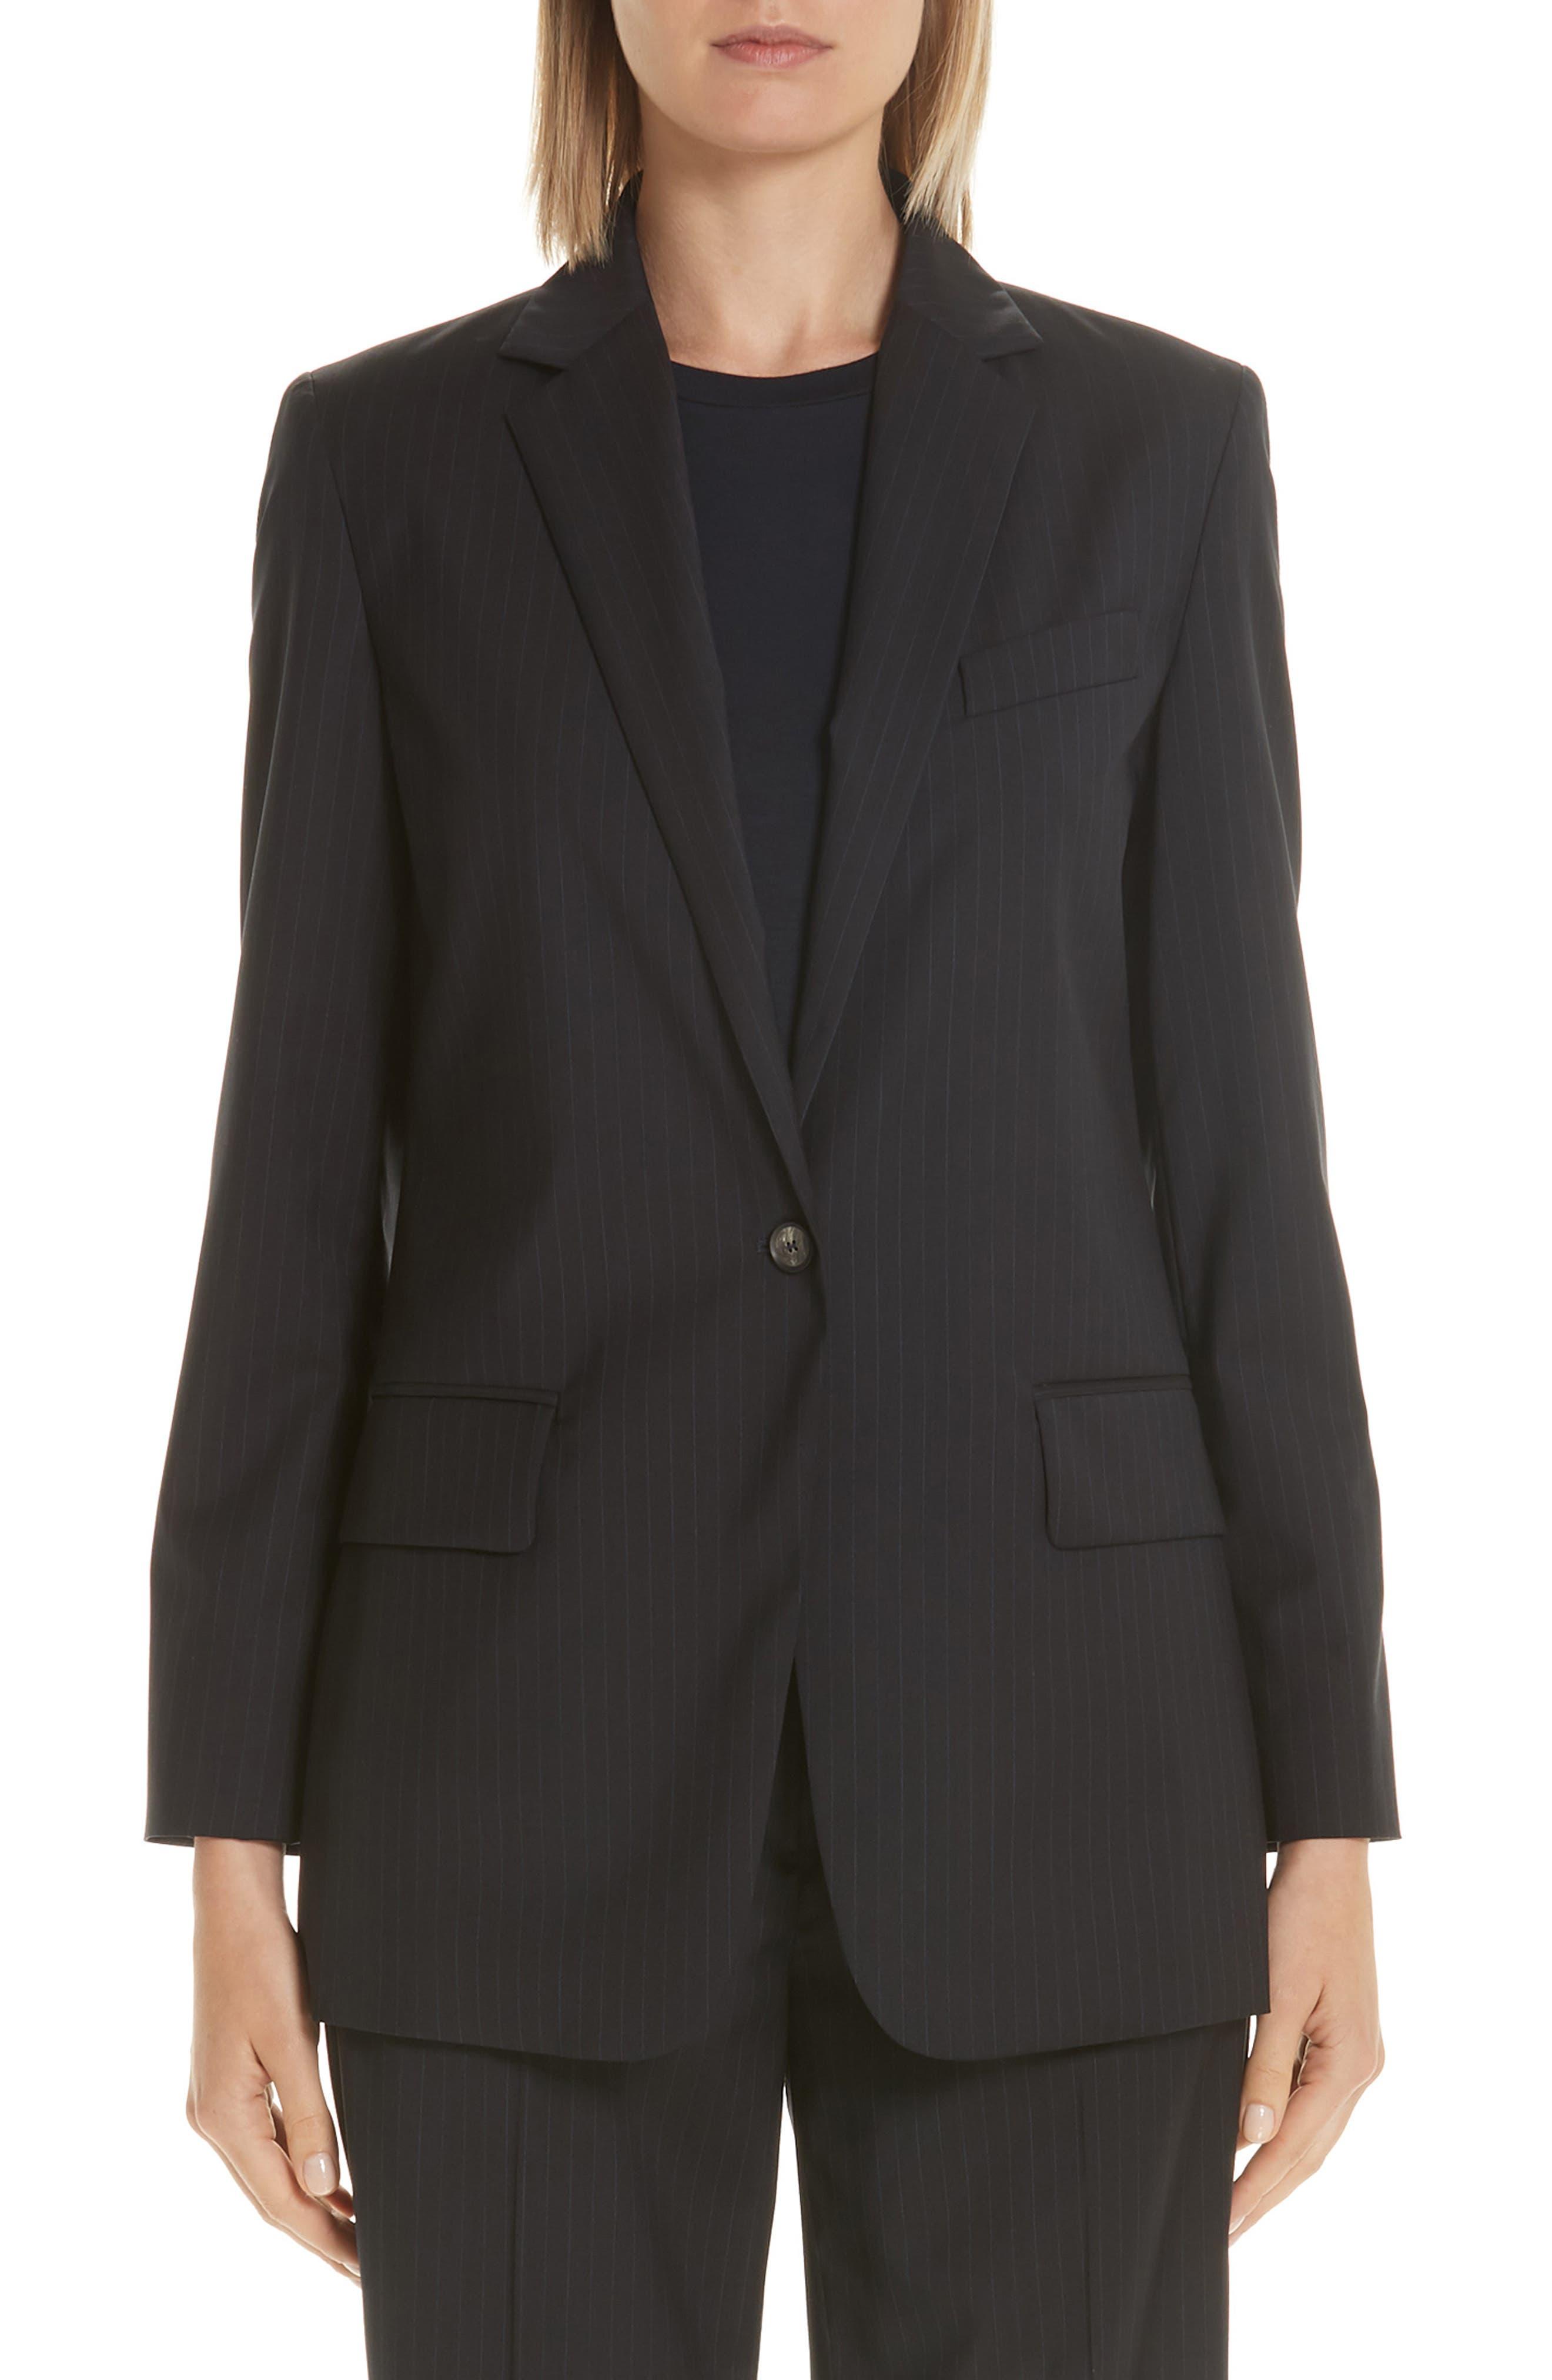 MAX MARA Laser Single Button Wool Jacket, Main, color, ULTRAMARINE